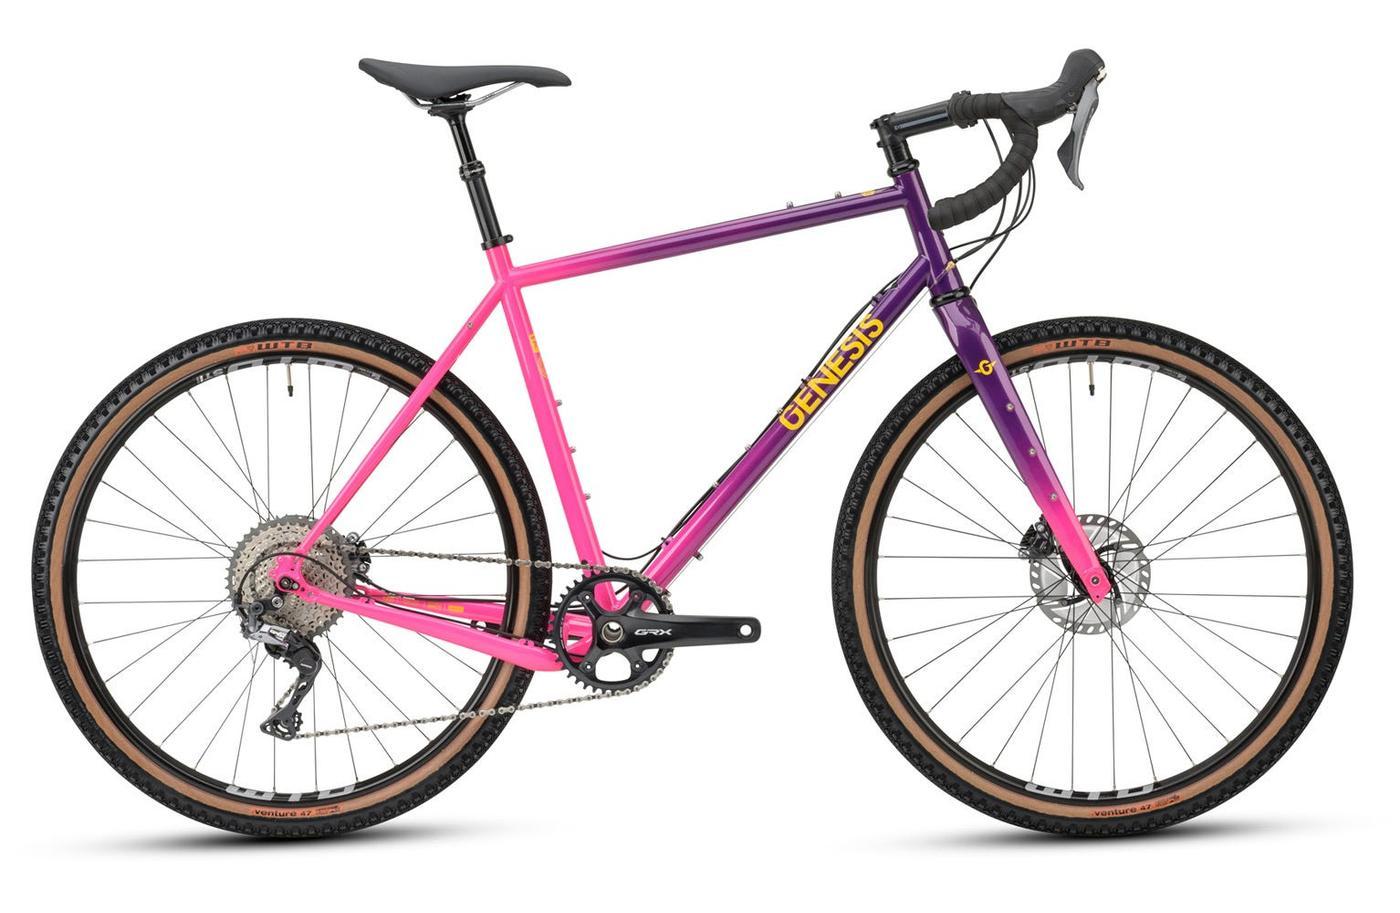 Genesis 2021 Fugio 30 Gravel Bike Sports a Flashy Paint Job on a Reynolds 725 Tubeset